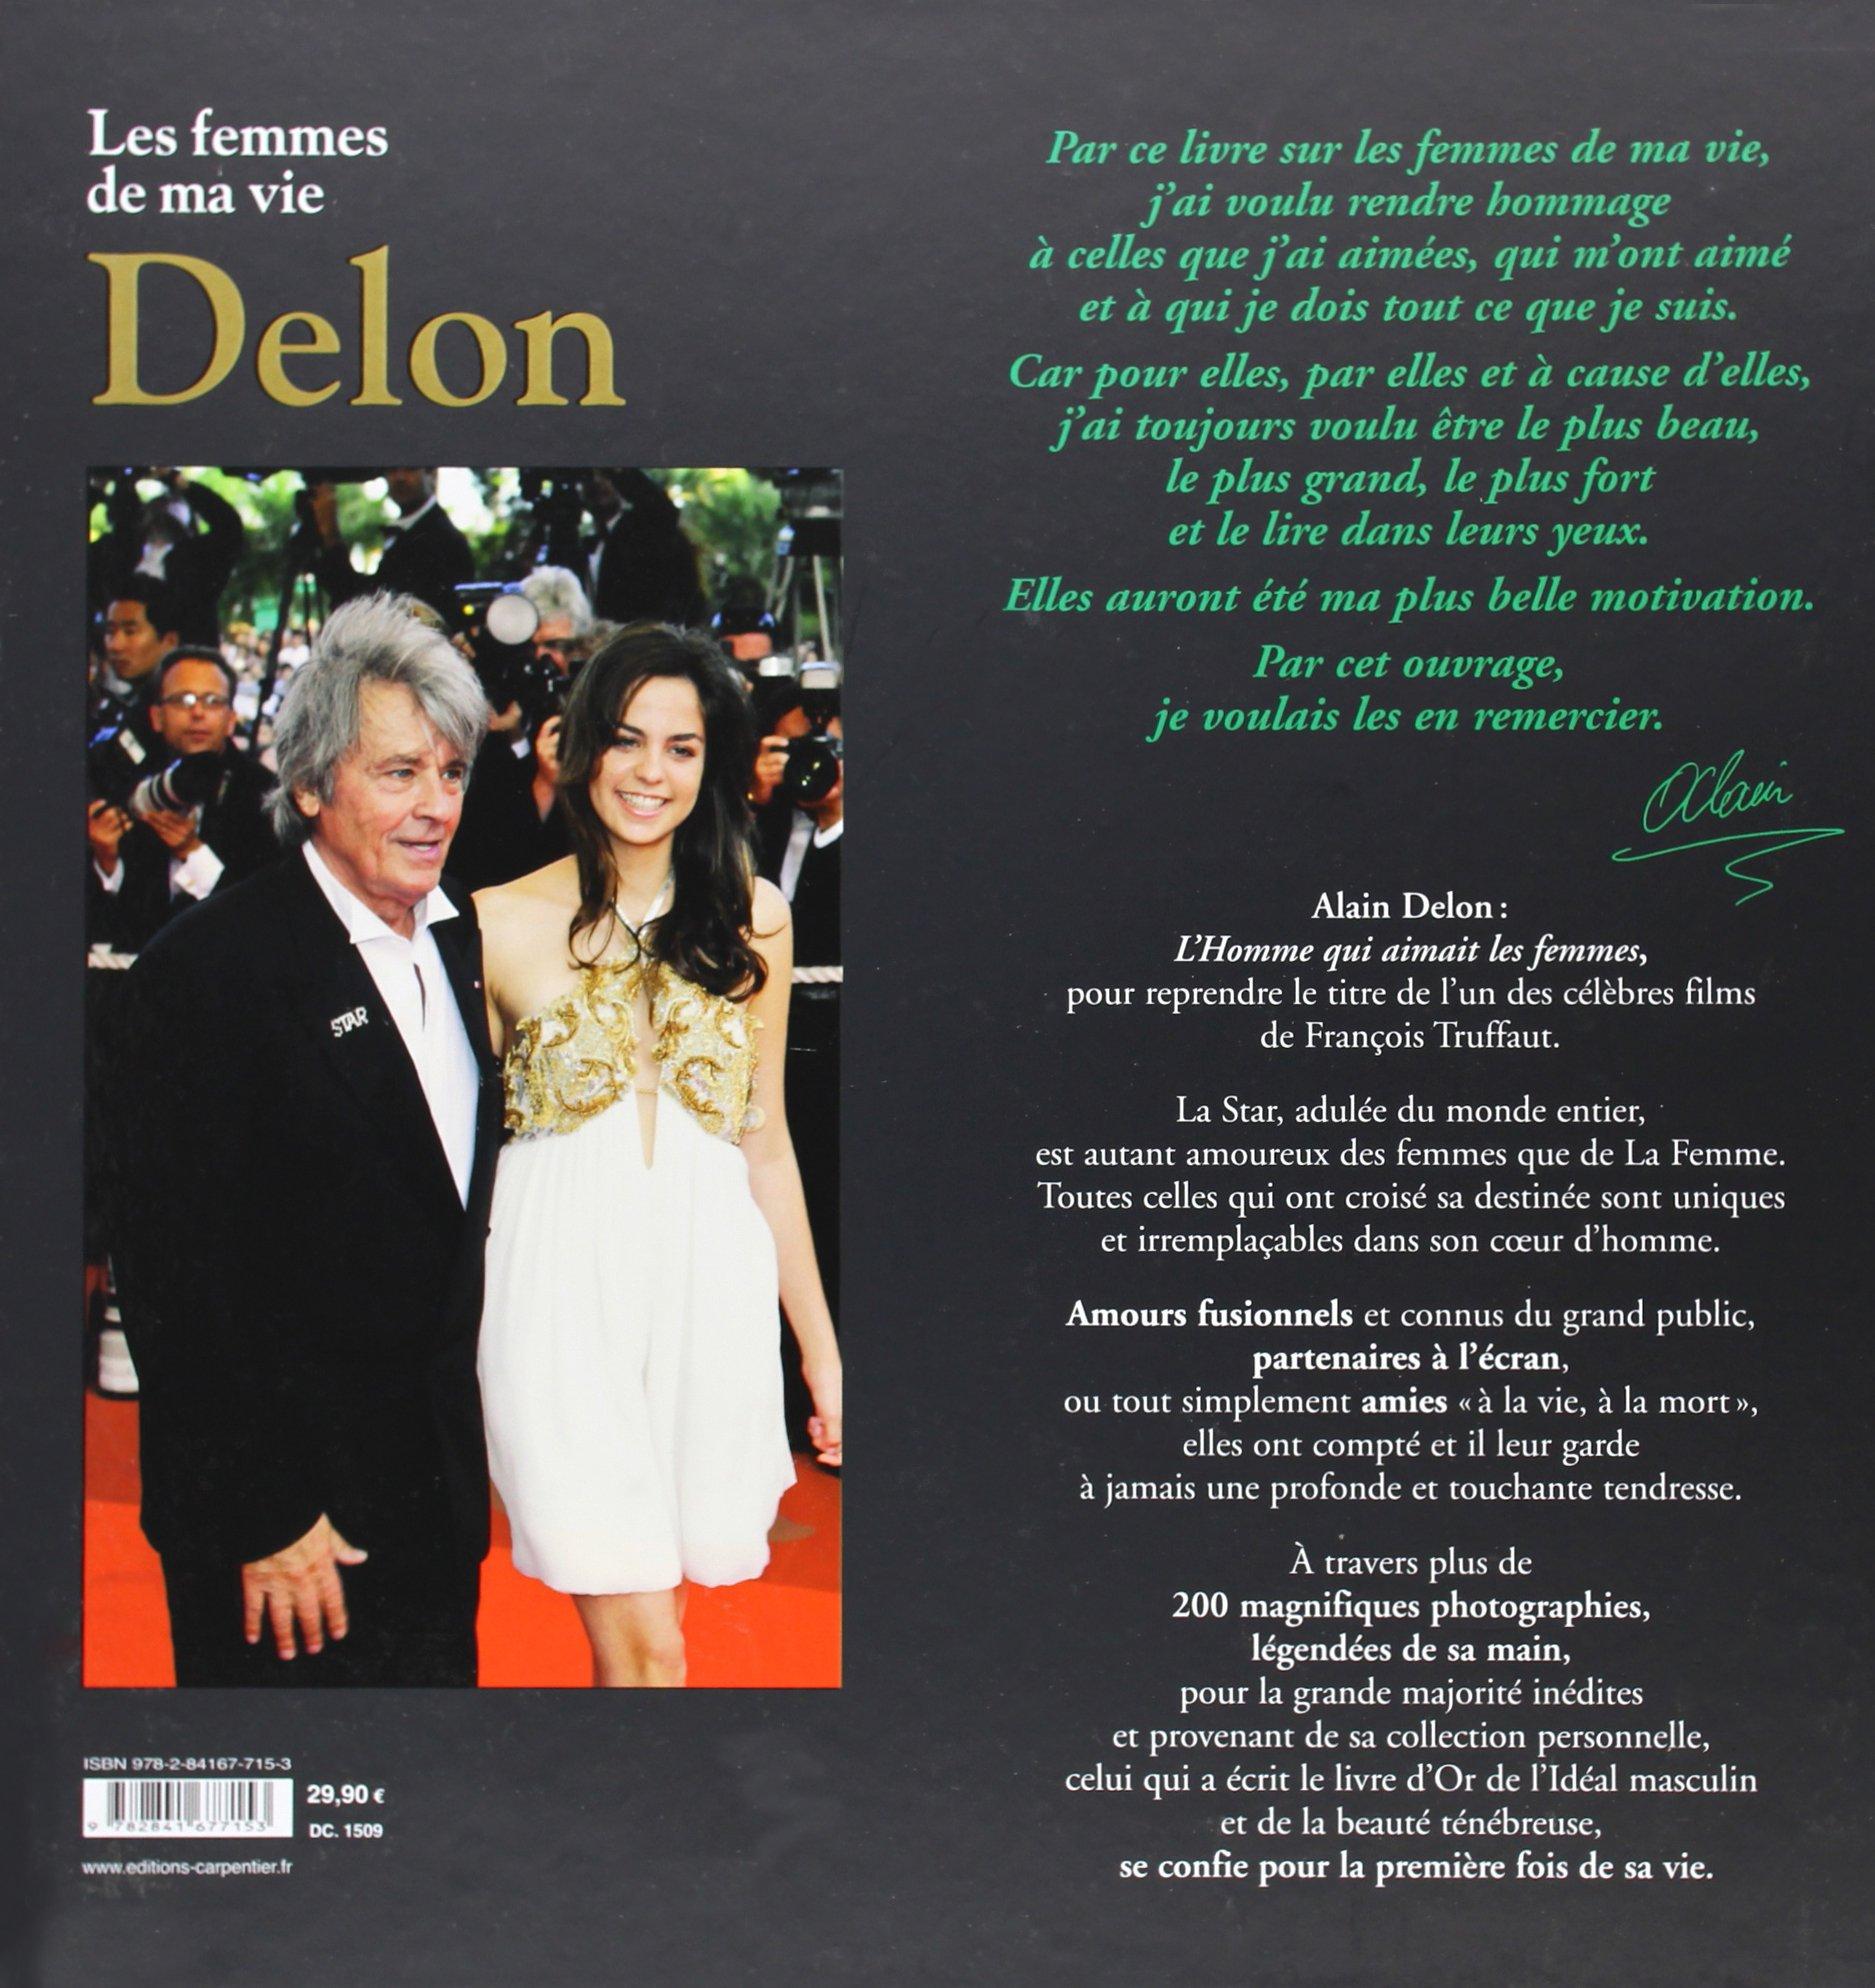 Delon Les Femmes De Ma Vie Amazones Alain Delon